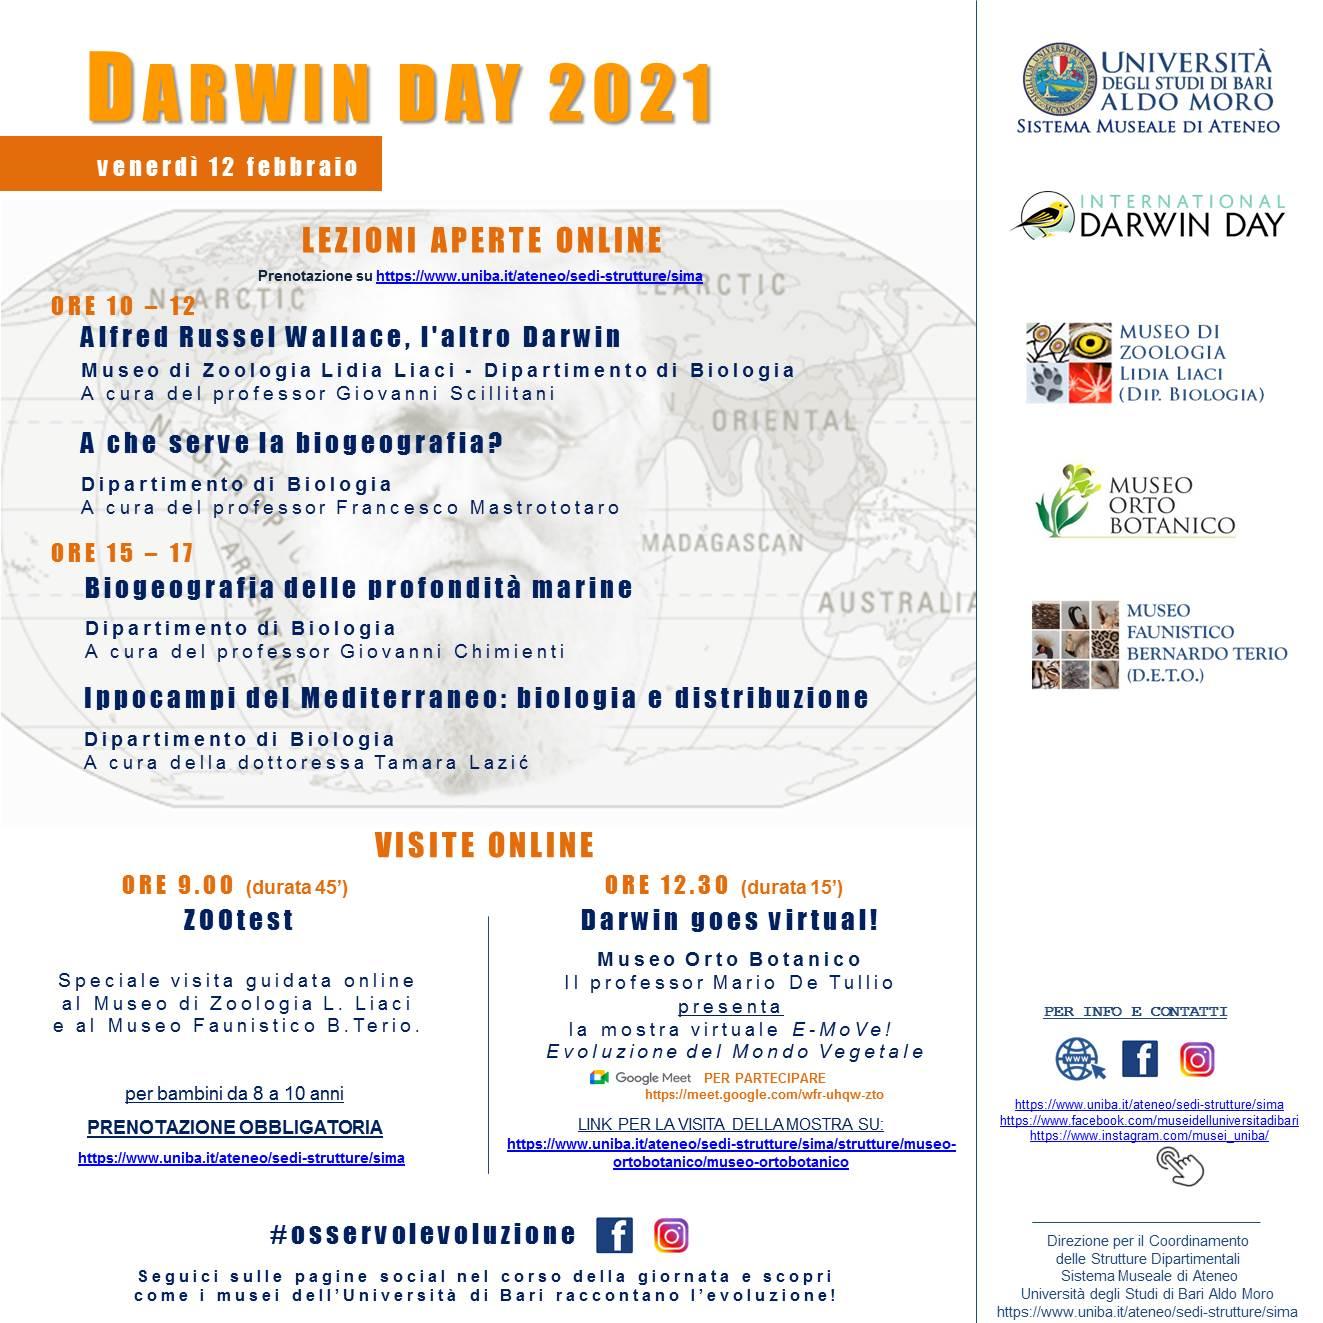 http://www.icom-italia.org/wp-content/uploads/wpforms/10320-346379fc8433371d8ed056fee97d2a28/programma-Darwin-day-2021-SiMA-UnivBari-61ef43f5f410d06bcb7c16d24c2ae552.jpg